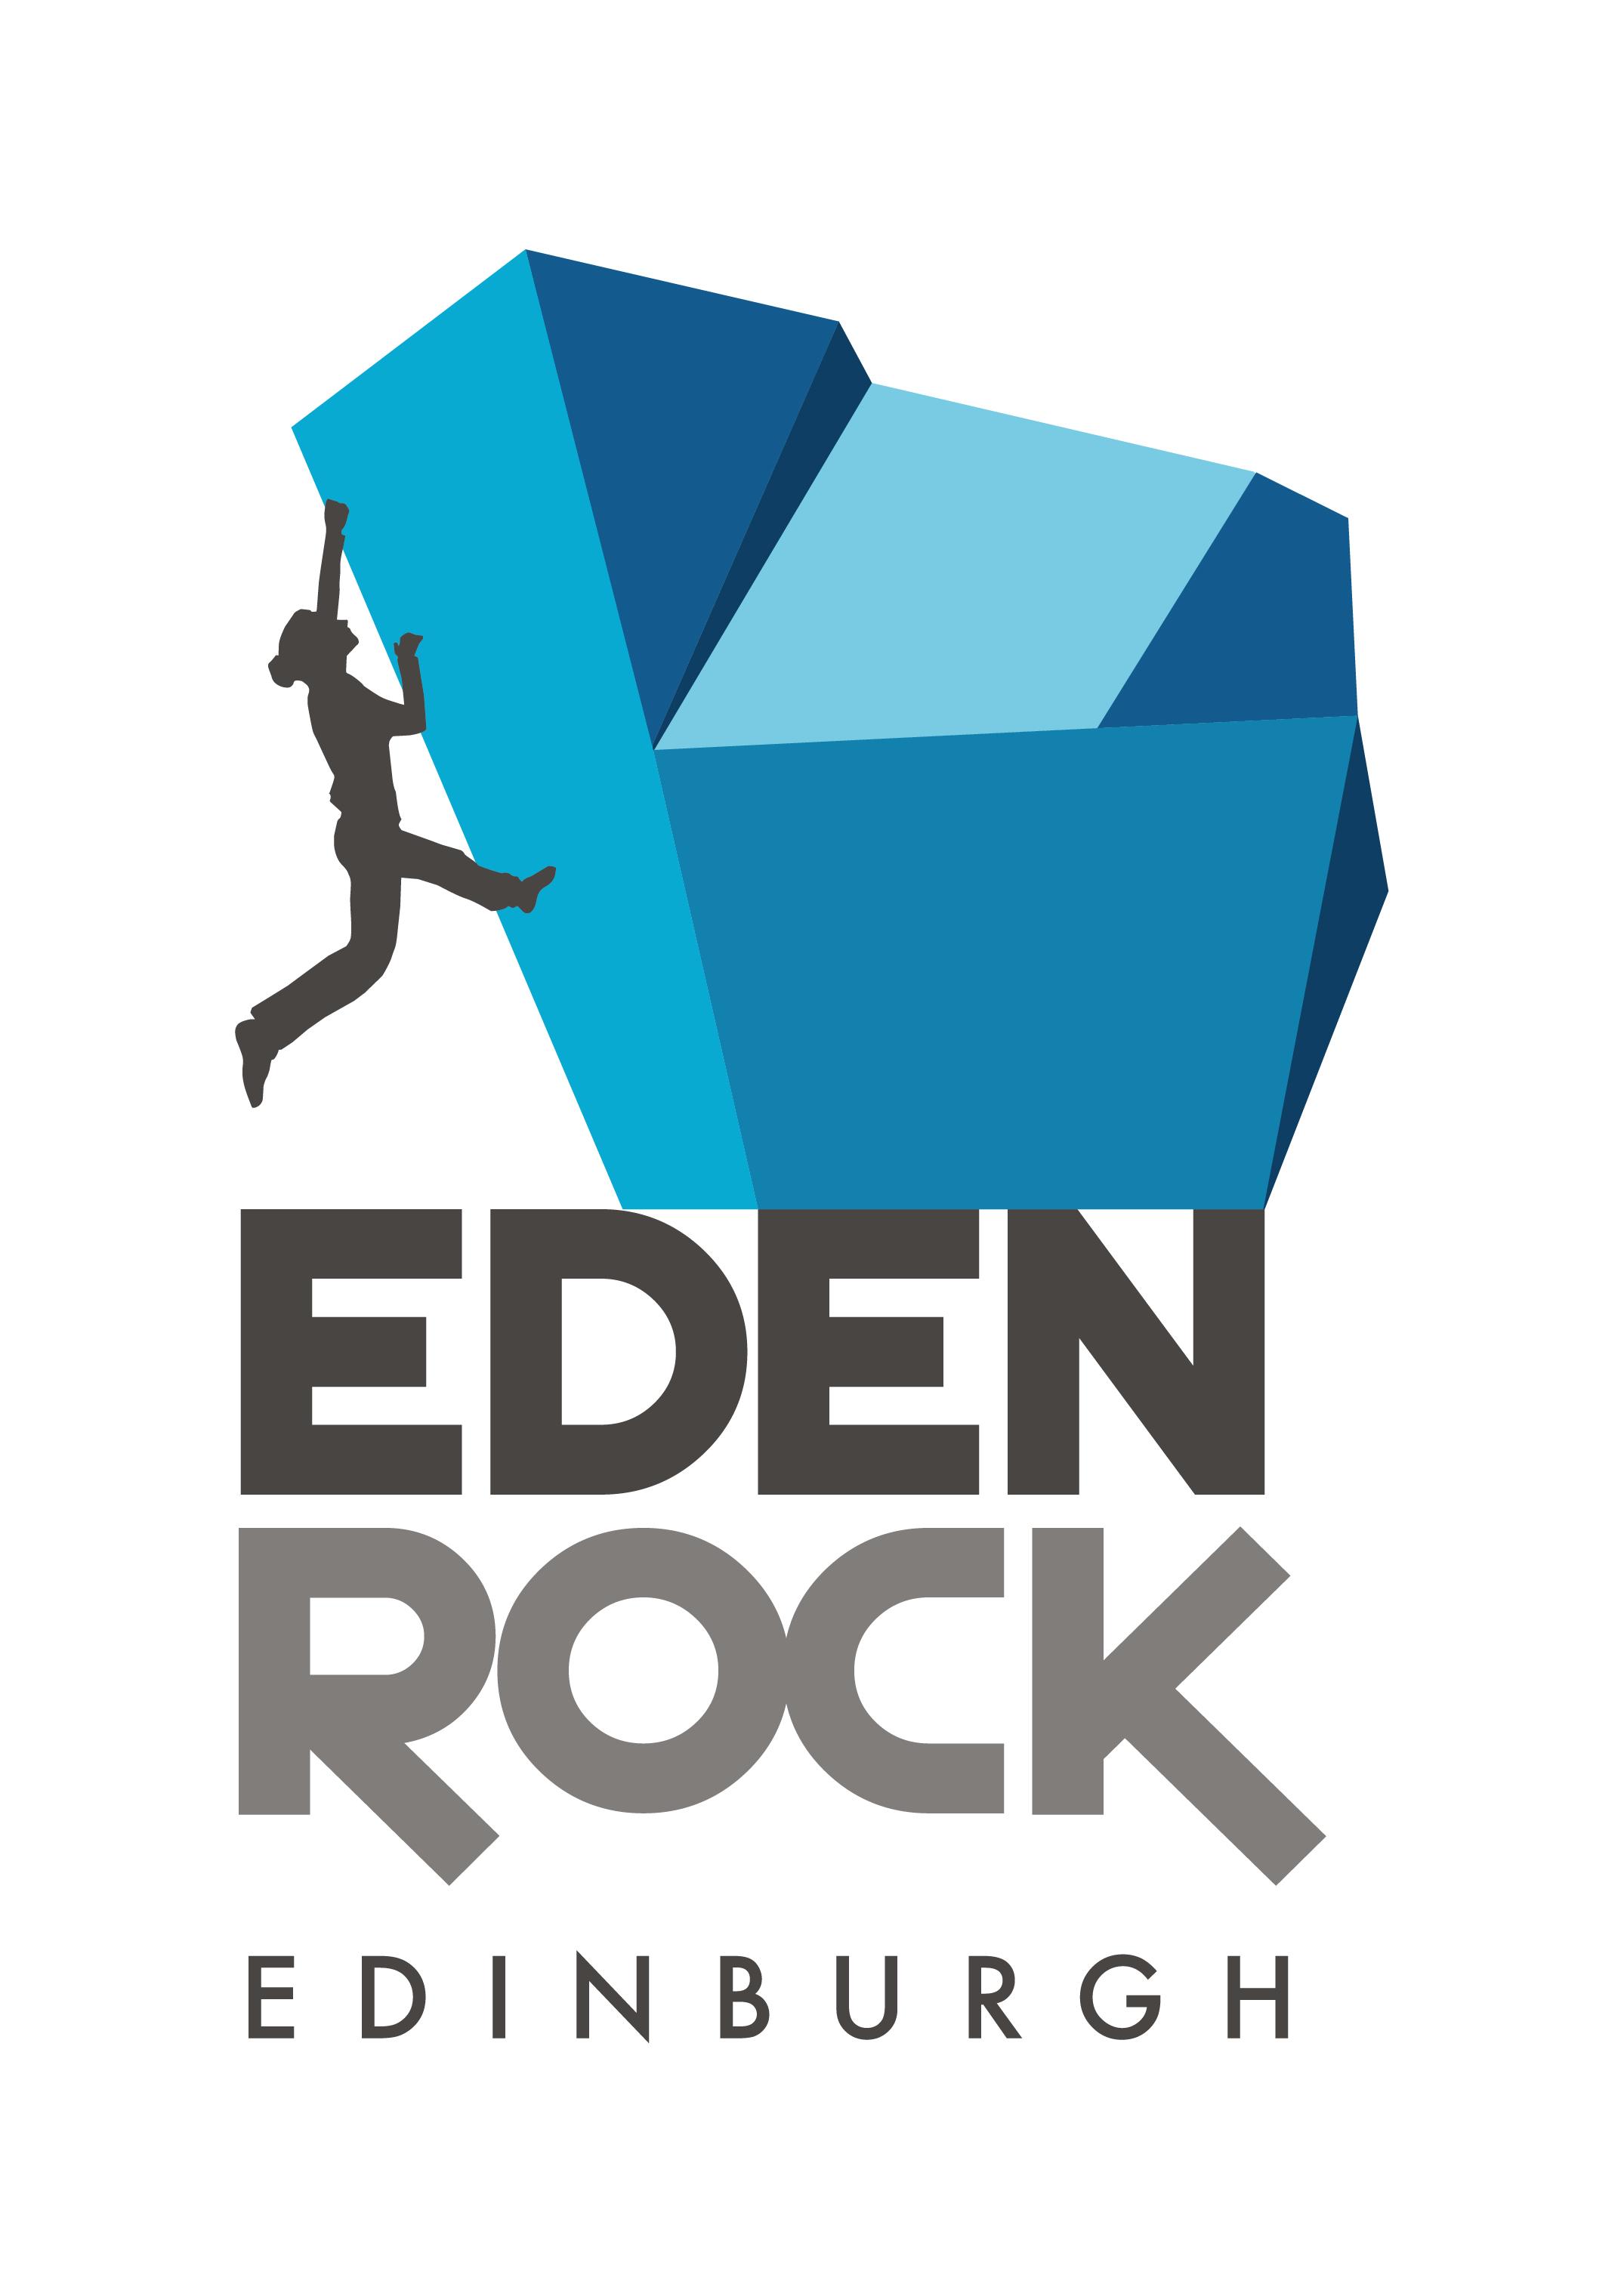 Logo design and rebrand